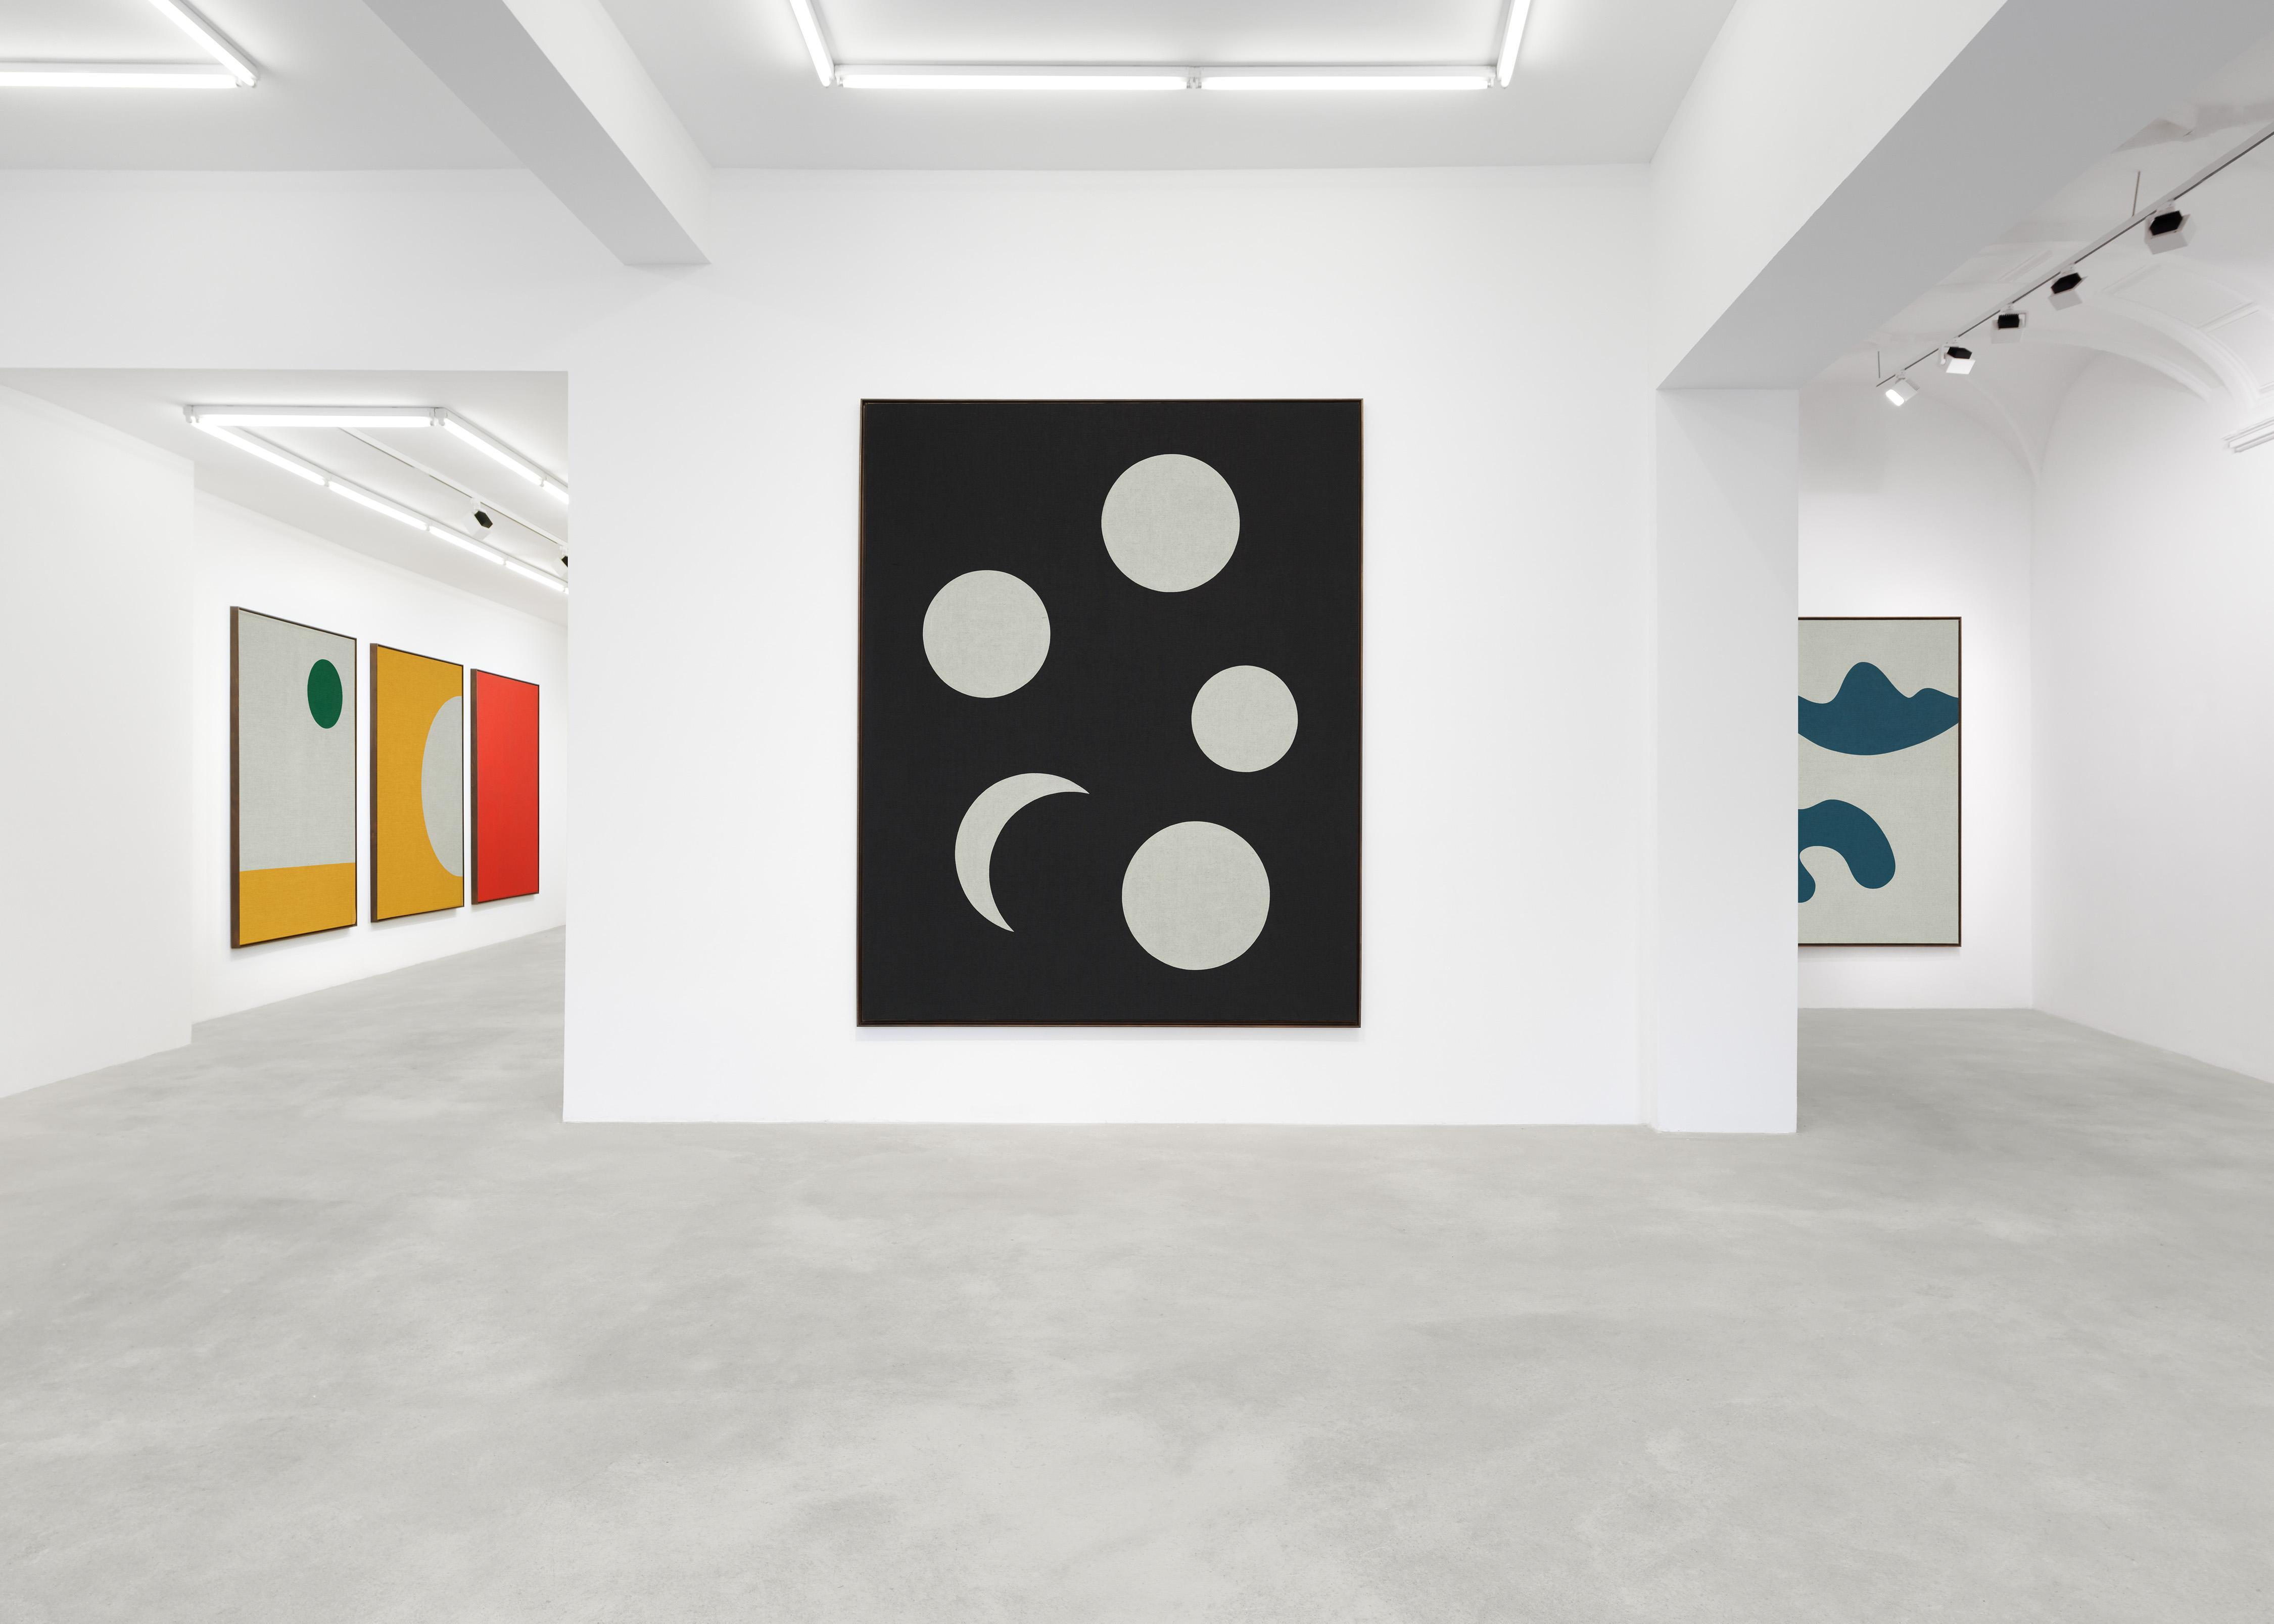 Antonio Ballester Moreno Installation views, 'DAY' Tanya Leighton, Berlin. 12 March – 17 April 2021 Photography: Gunter Lepkowski.